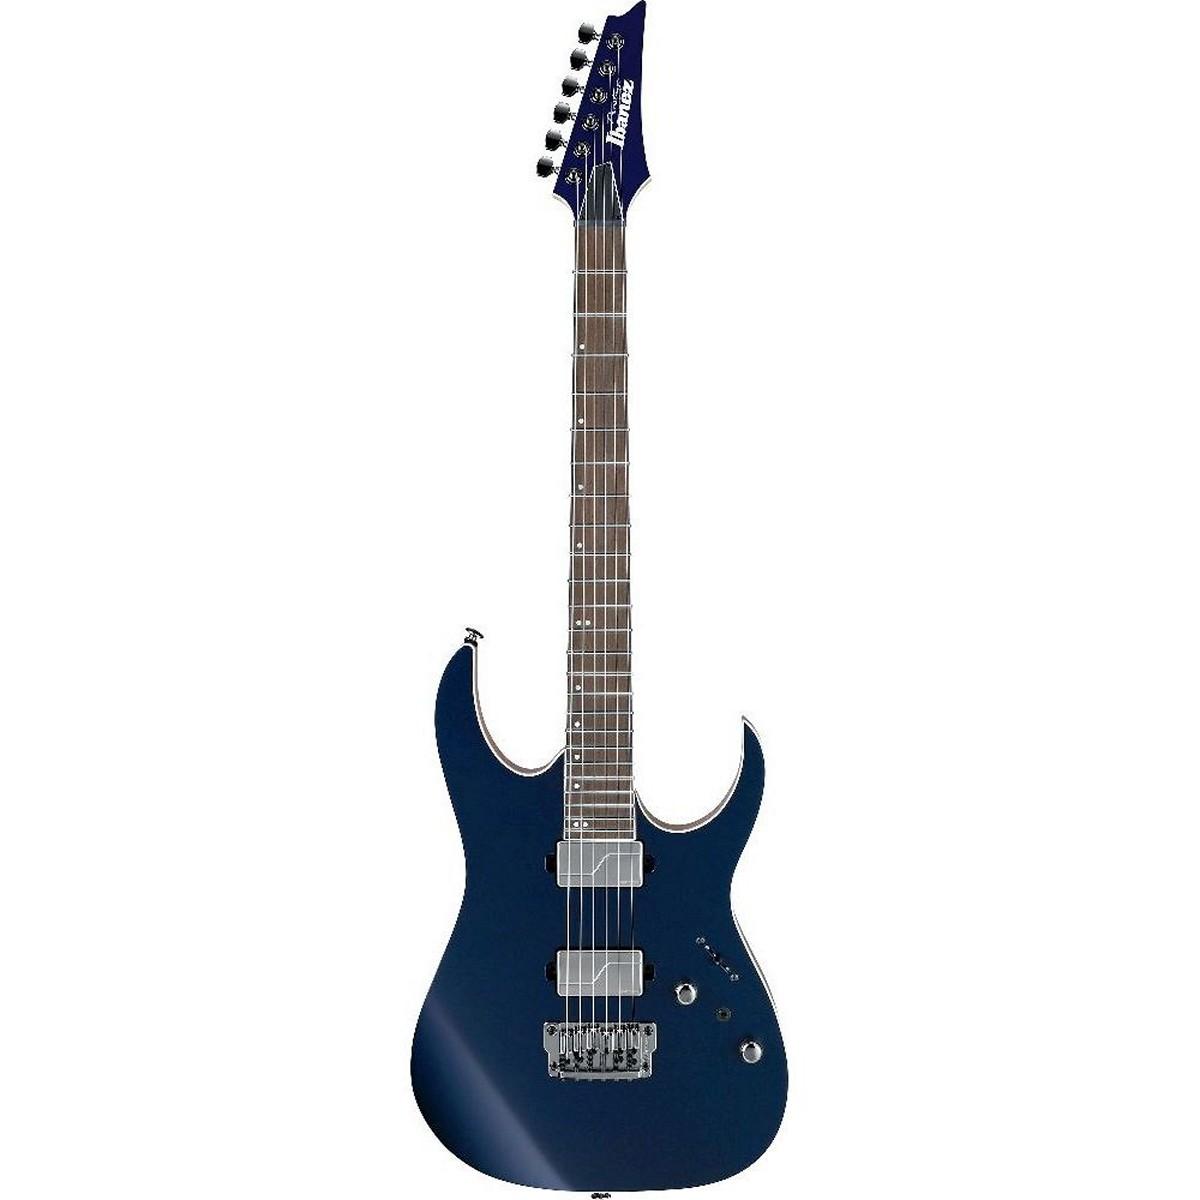 IBANEZ RG5121-DBF DARK TIDE BLUE FLAT